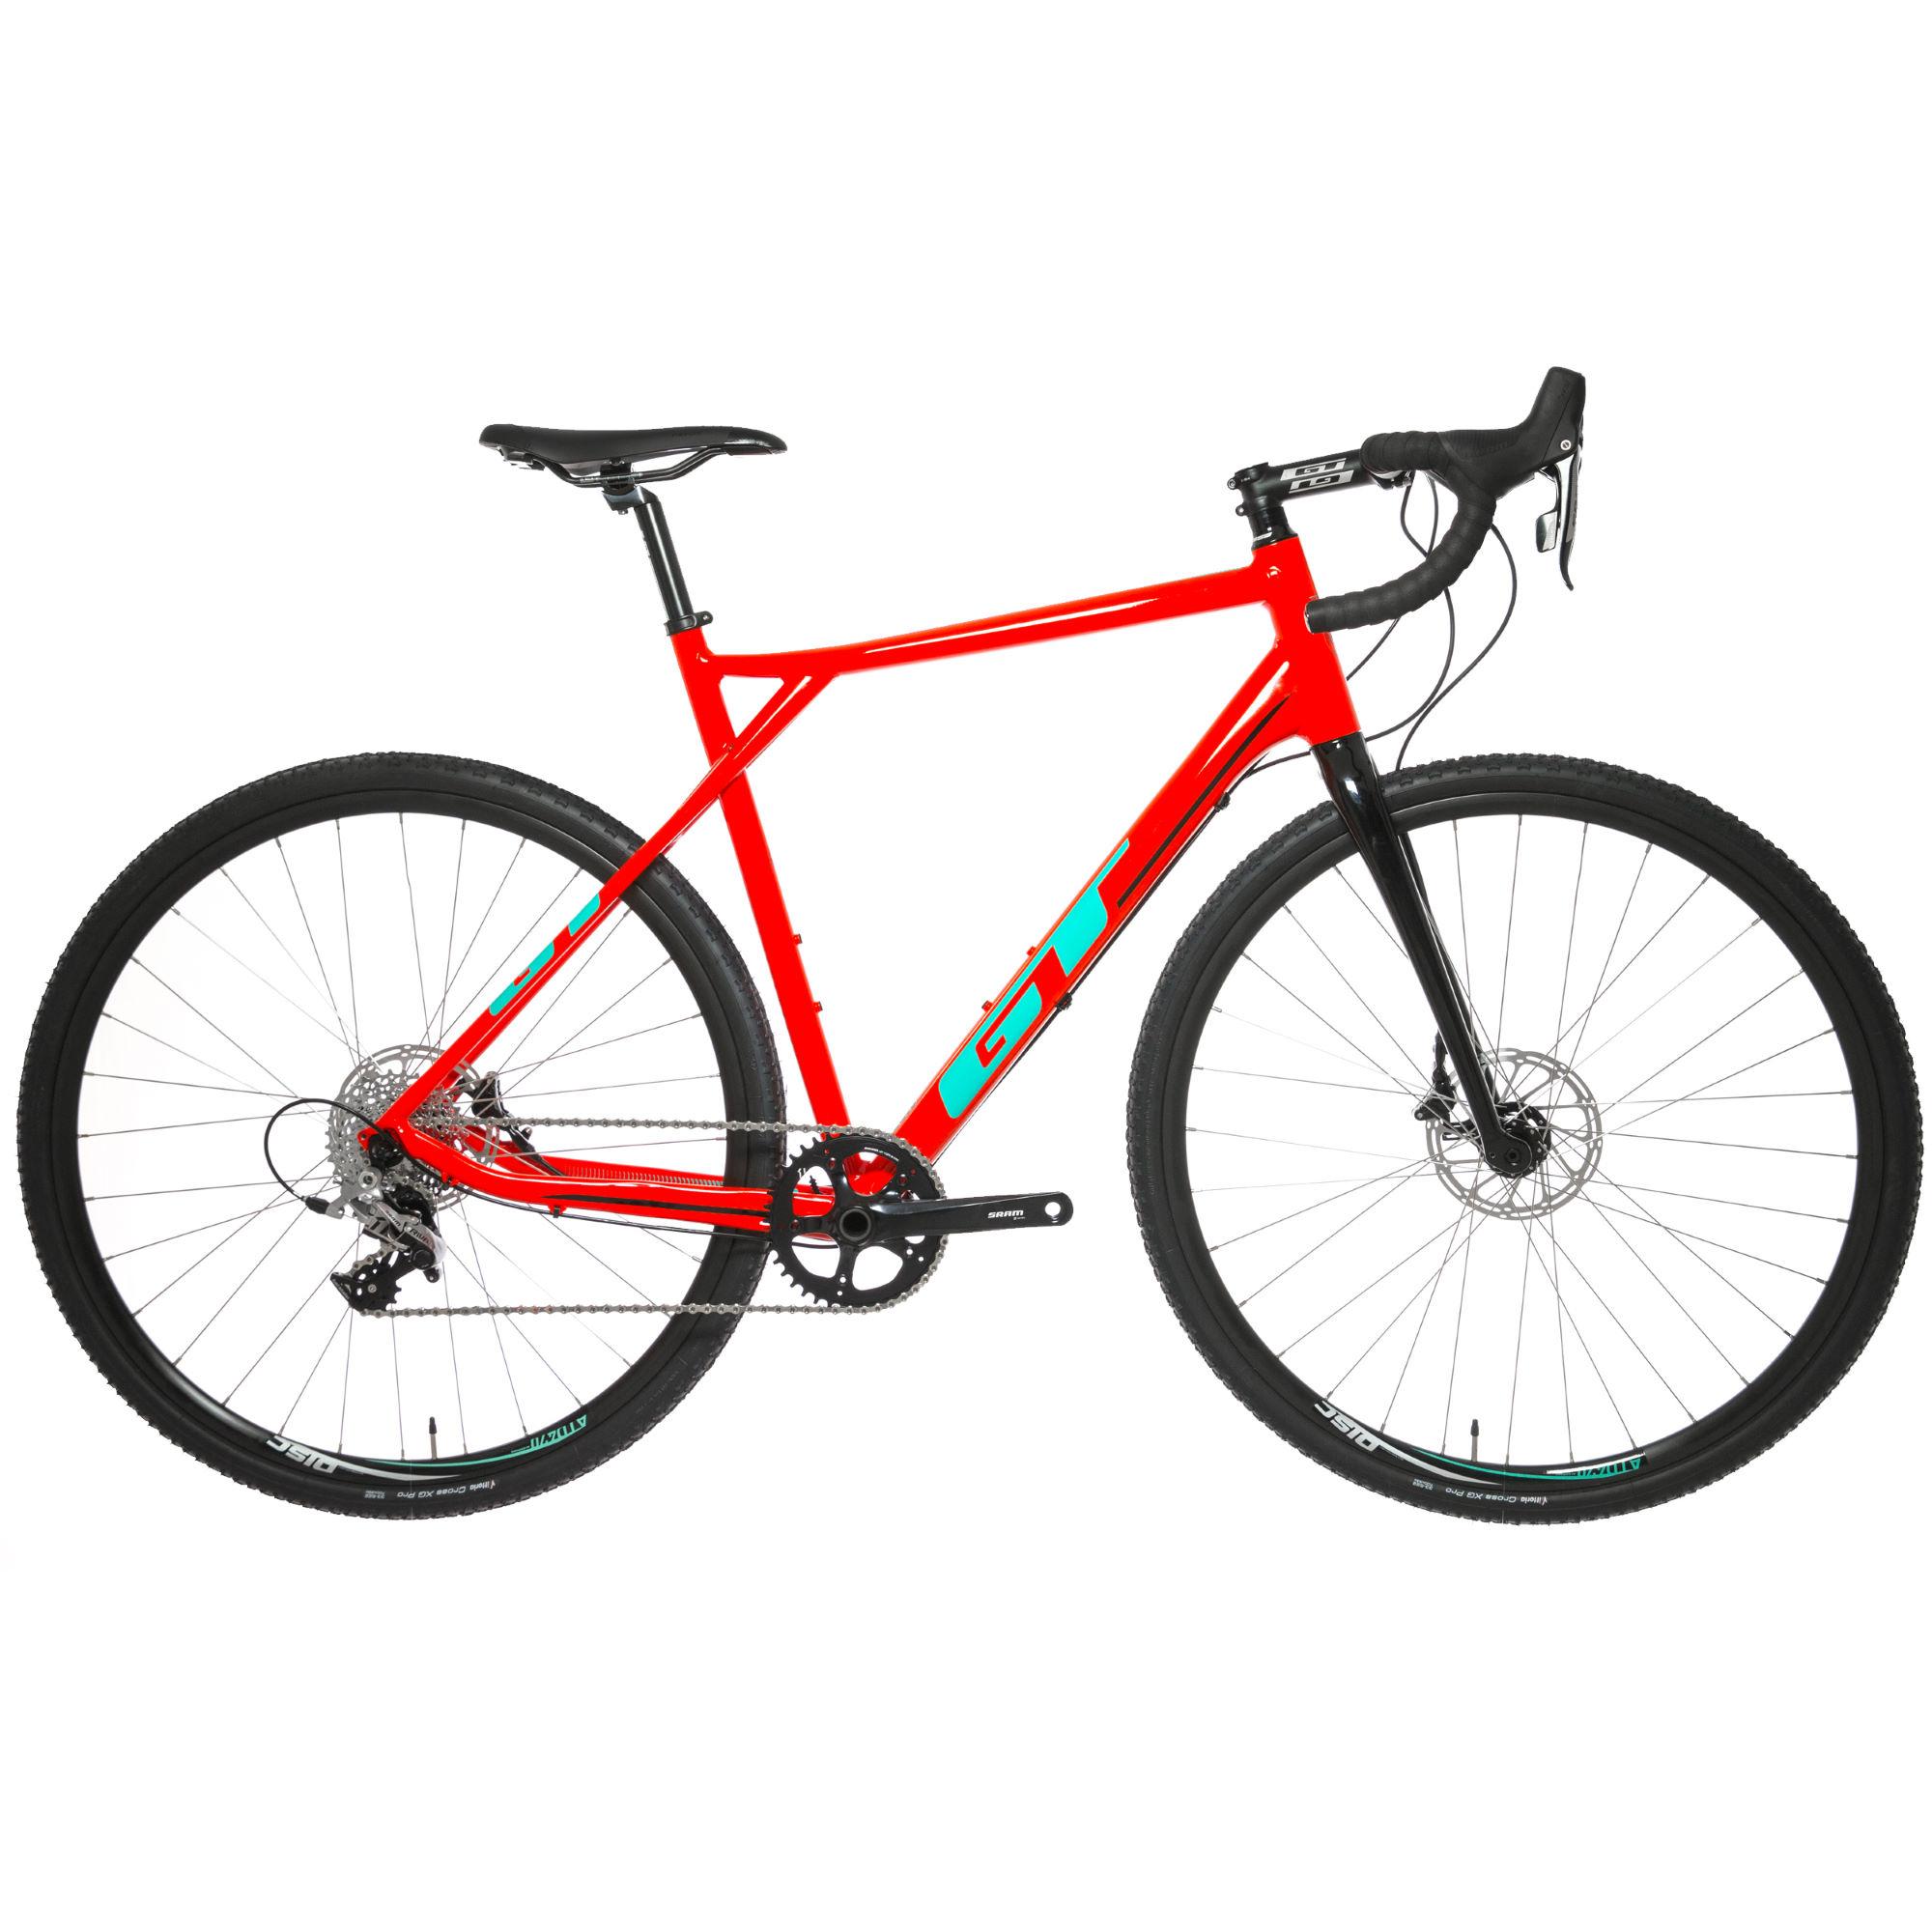 Rower cyclocross GT Grade AL CX @ Wiggle 4700 PLN rozmiary 56 i 58